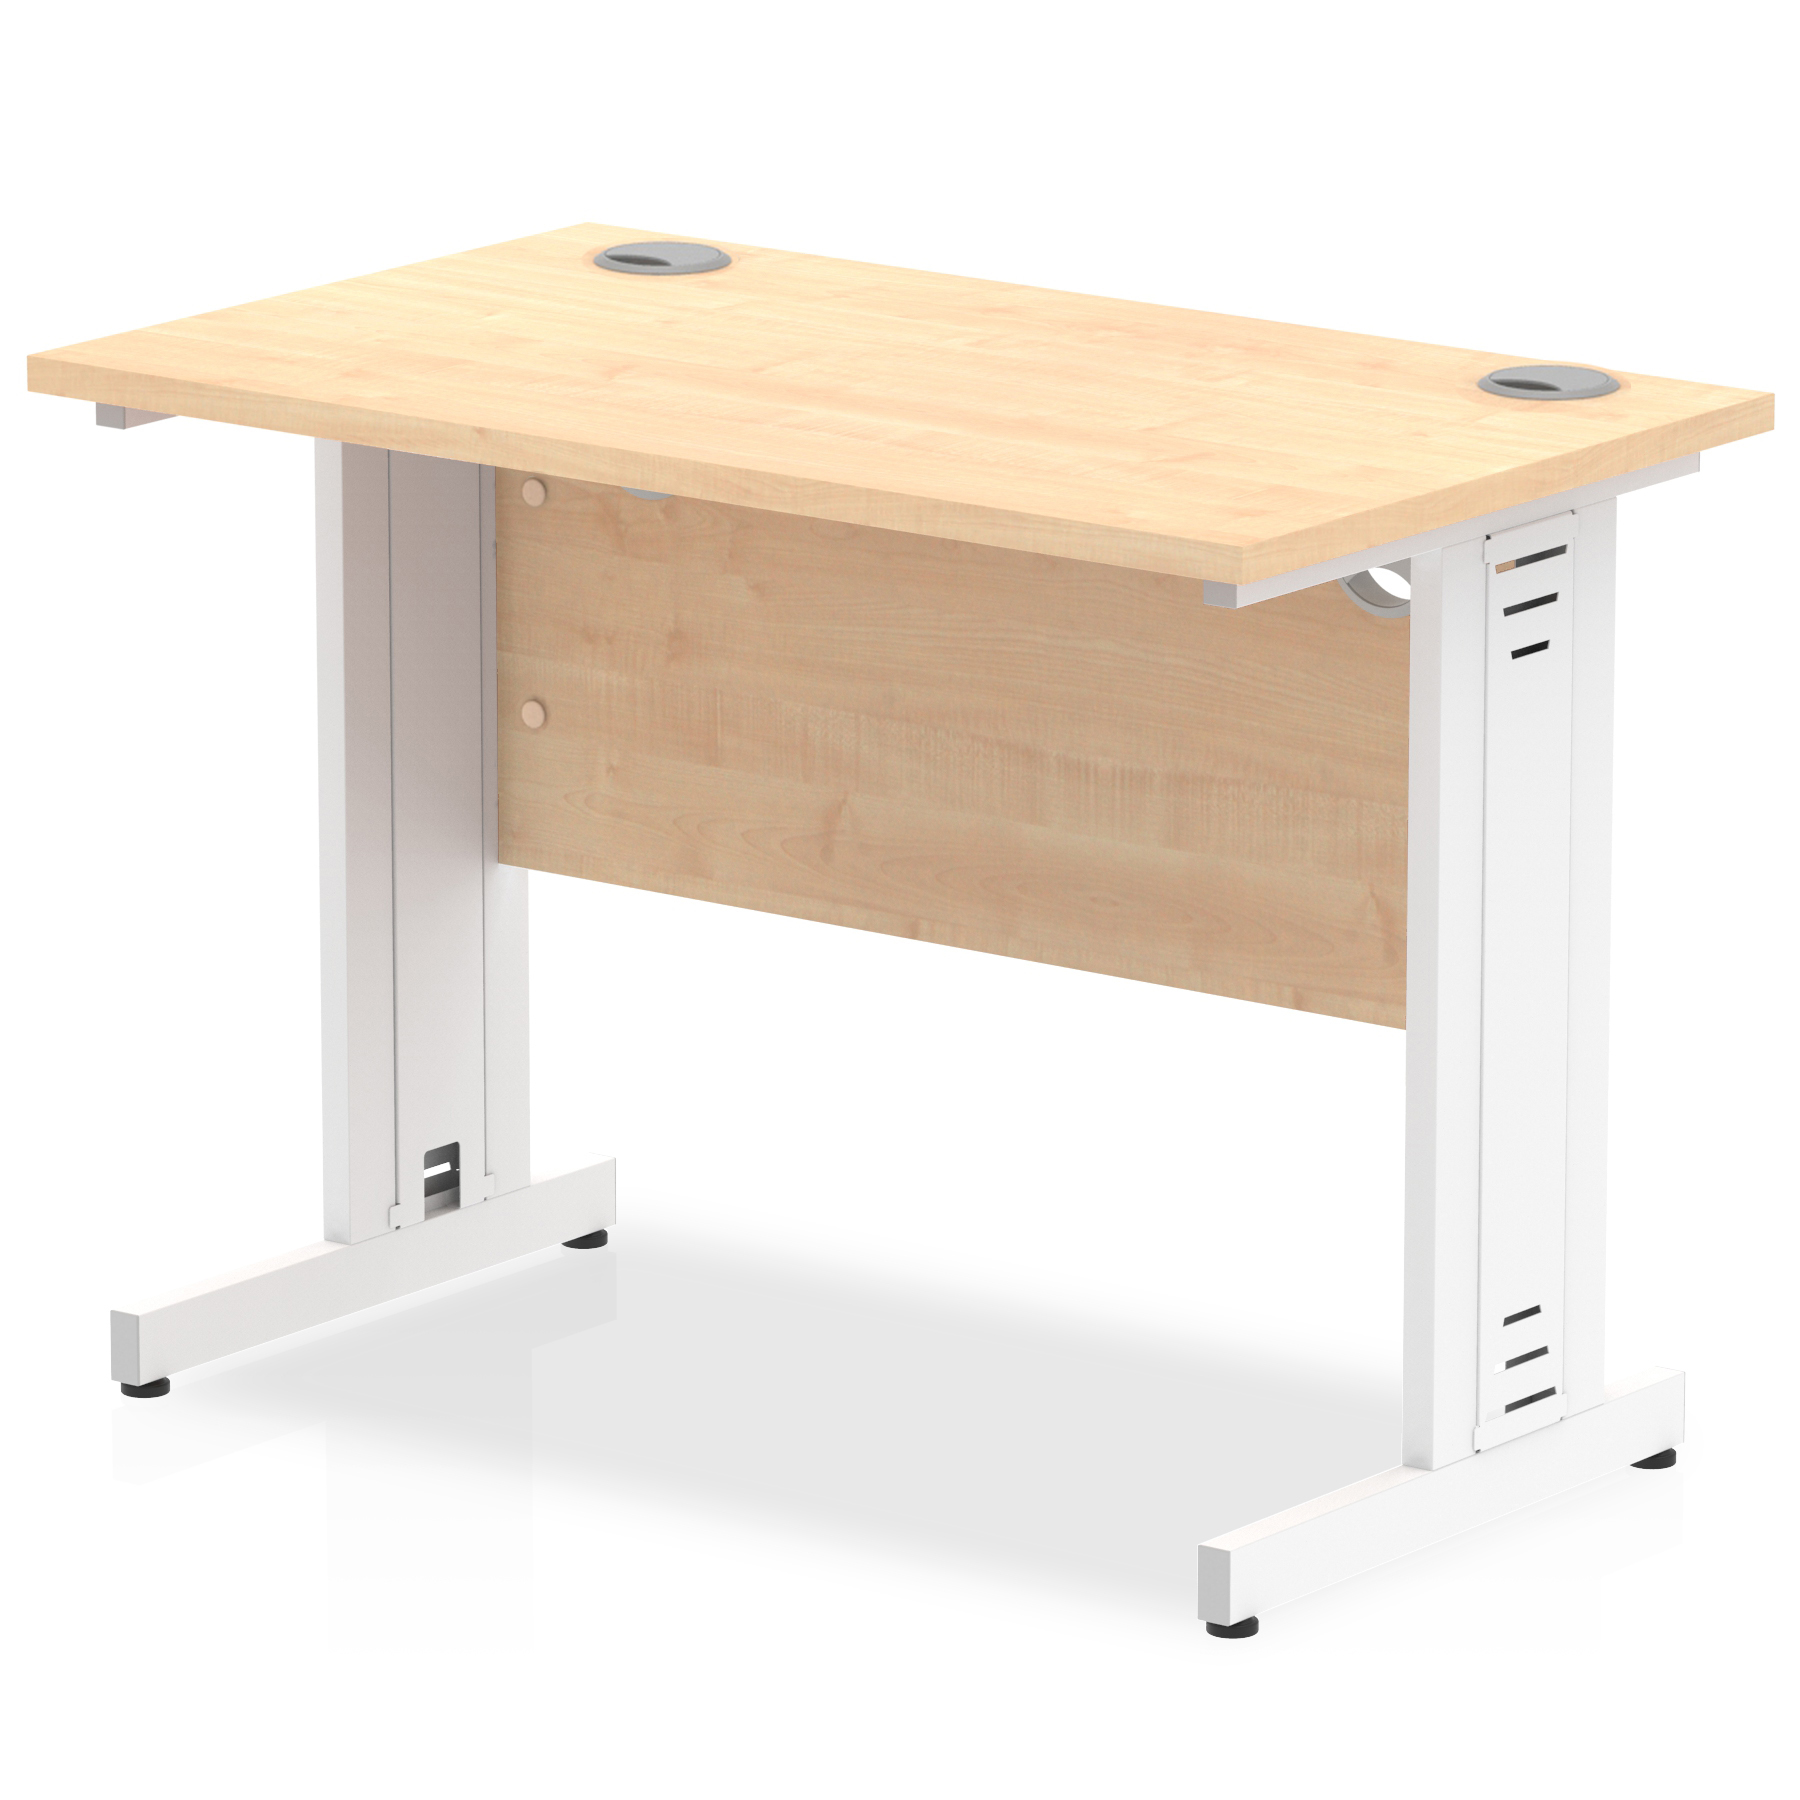 Trexus Desk Rectangle Cable Managed White Leg 1000x600mm Maple Ref MI002506